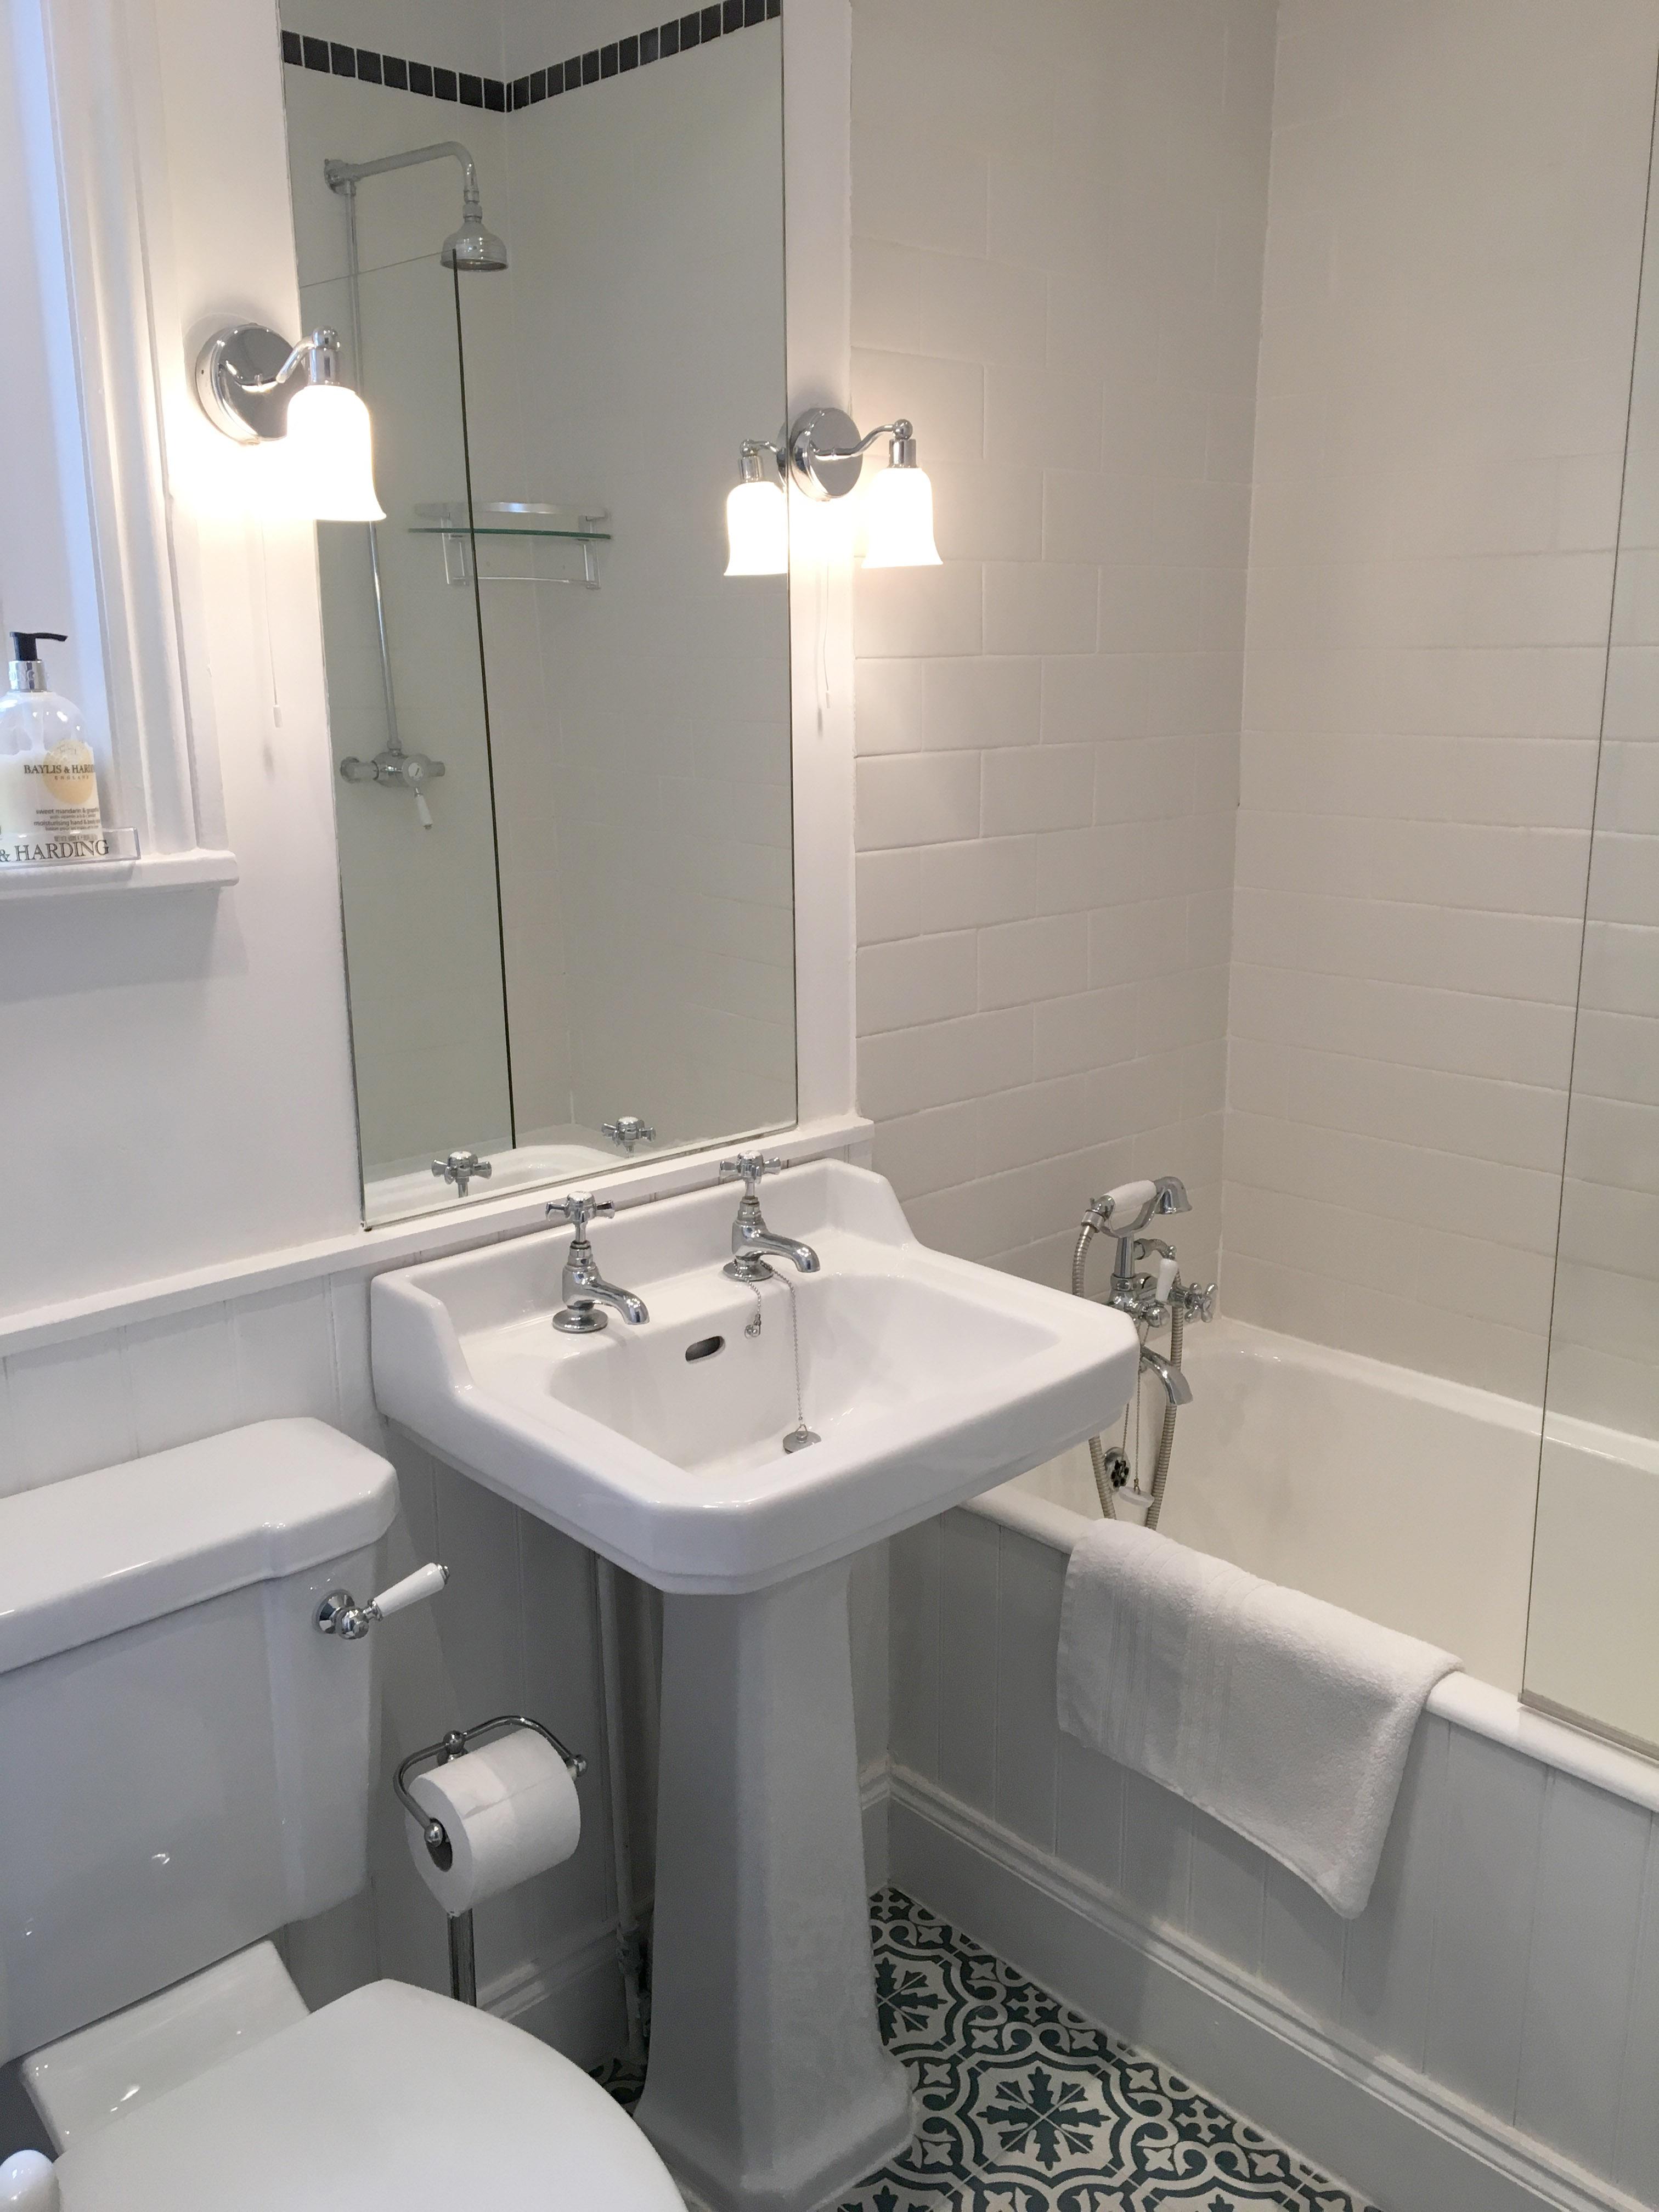 Main bathroom with overhead shower